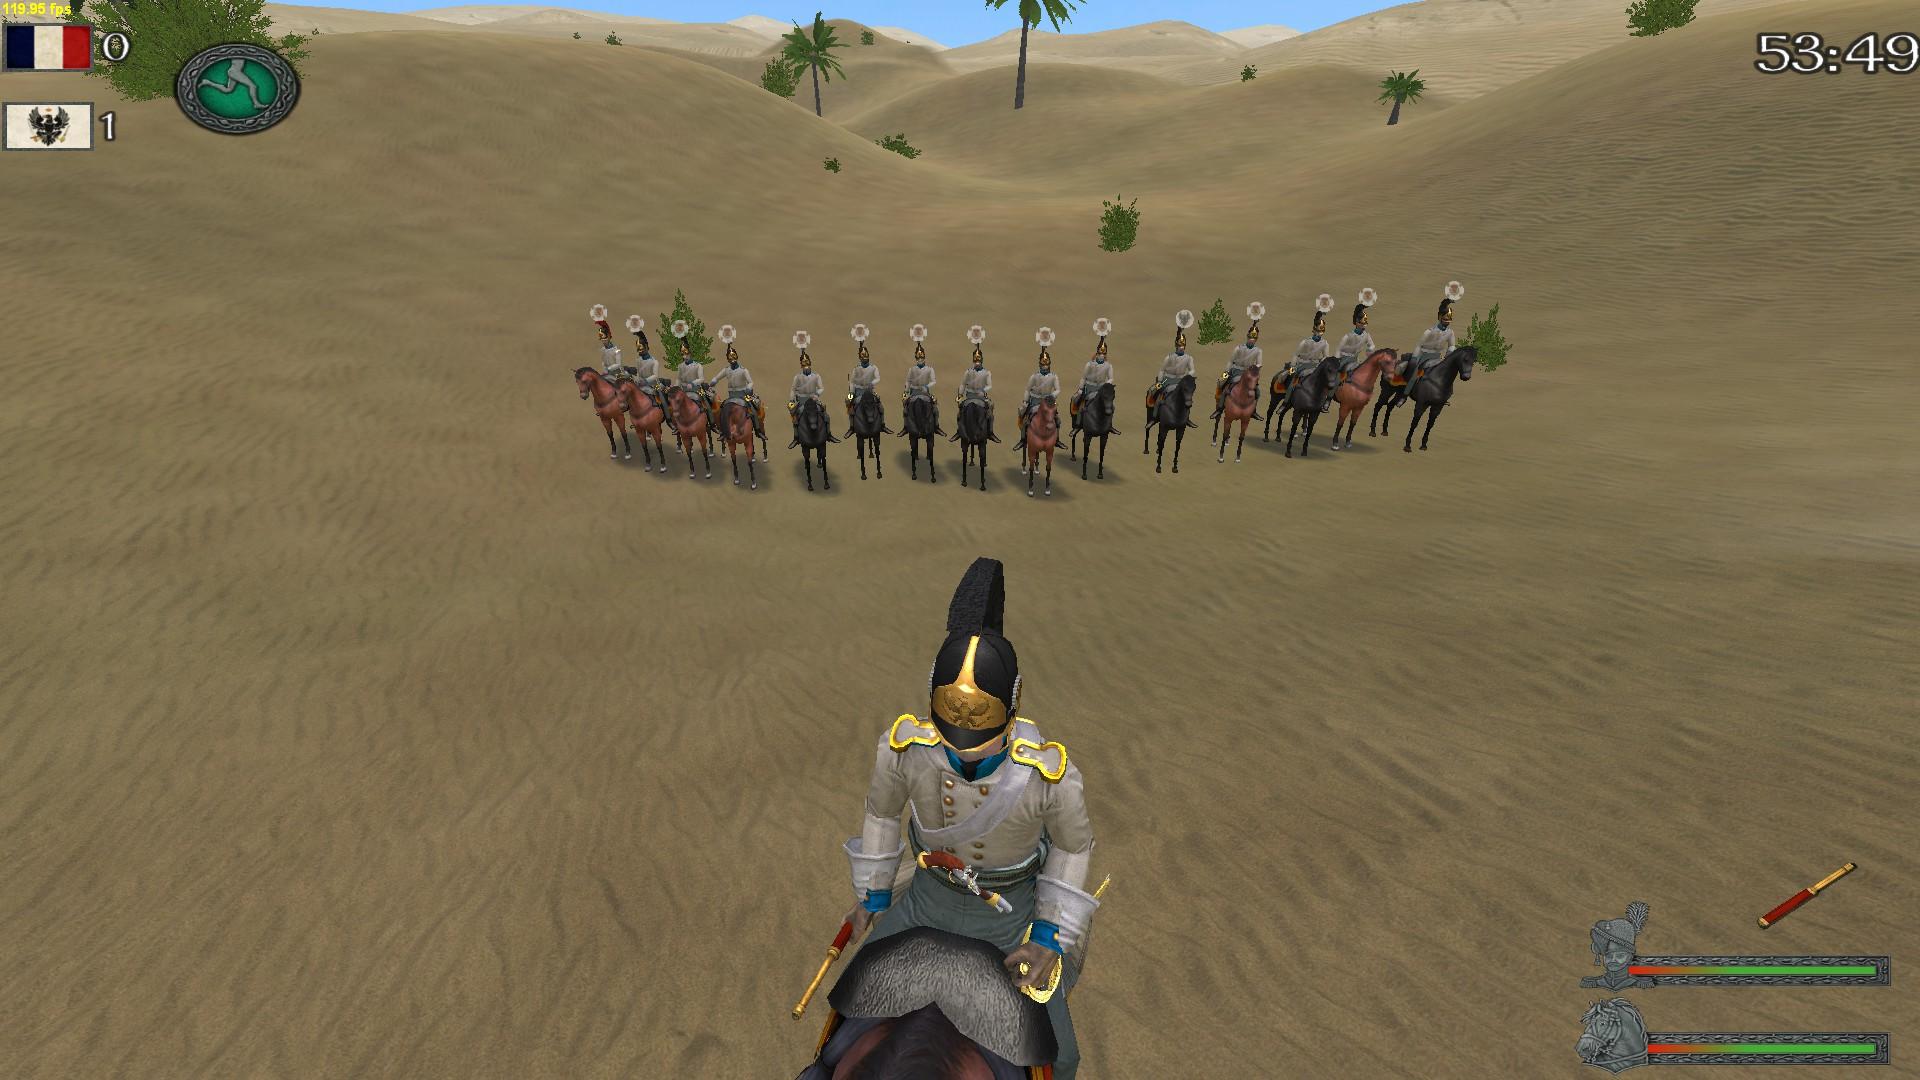 [CI] 5to Regimiento de la Corona   Reclutando Nuevos Miembros ! A4ea3b6bbbb11d85d1c0d25705e77399